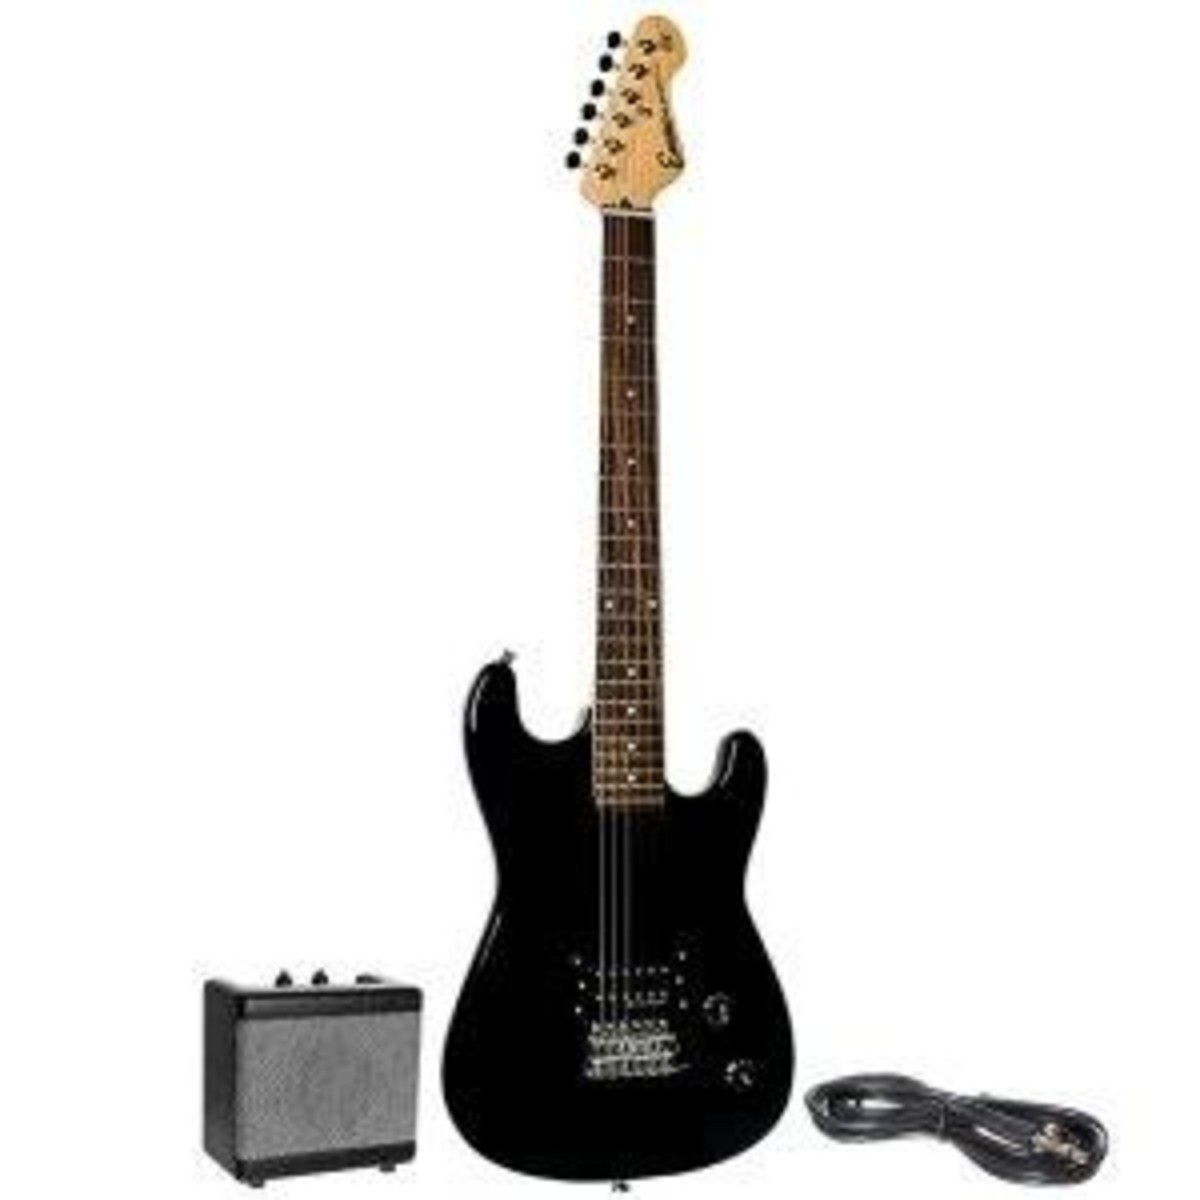 CD Encore E5 Electric Gitarre Pack, schwarz bei Gear4music